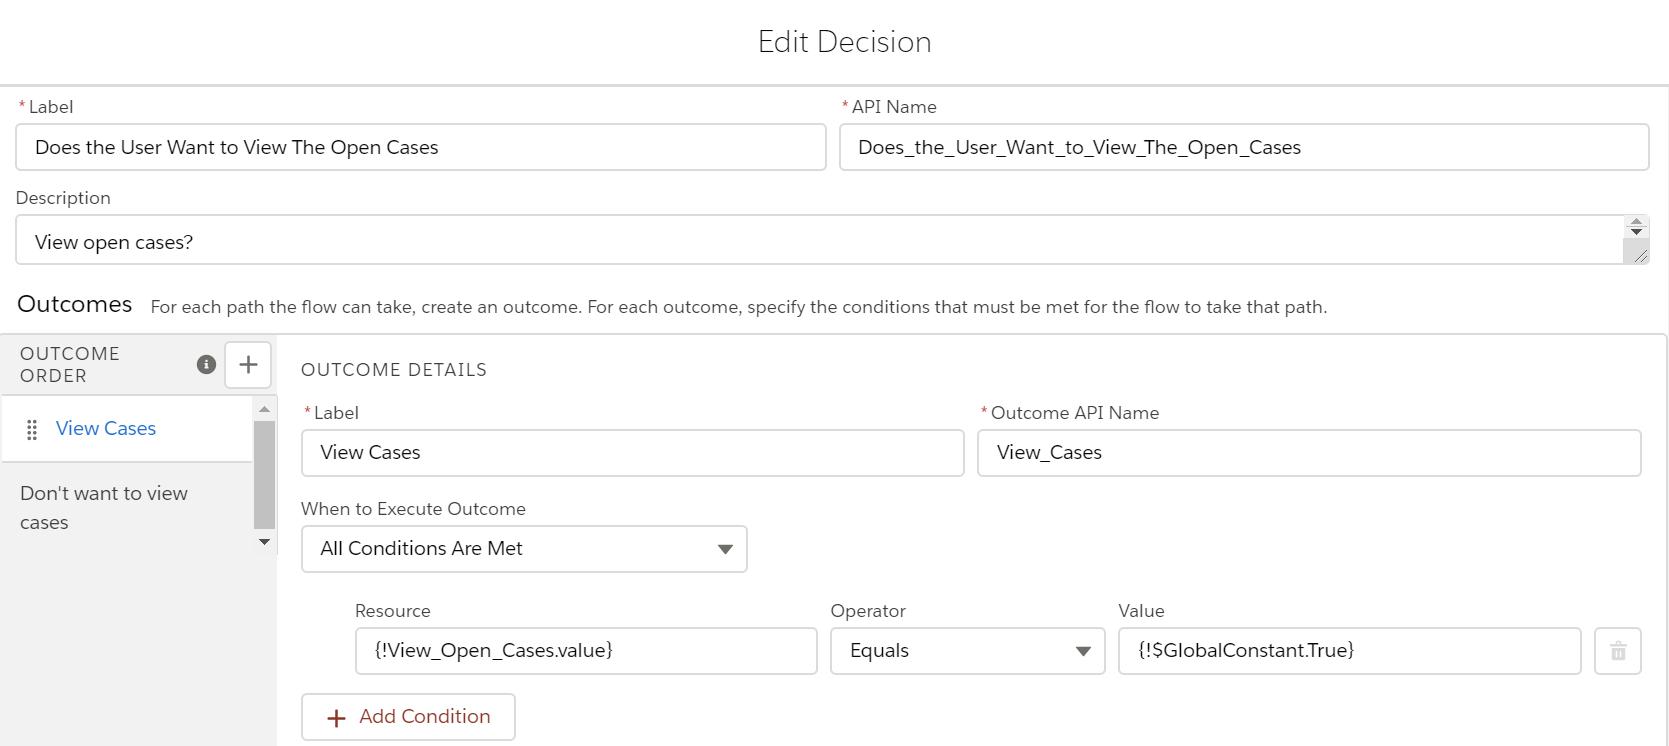 ViewAndEditOpenCaseFlow-Decision1.PNG